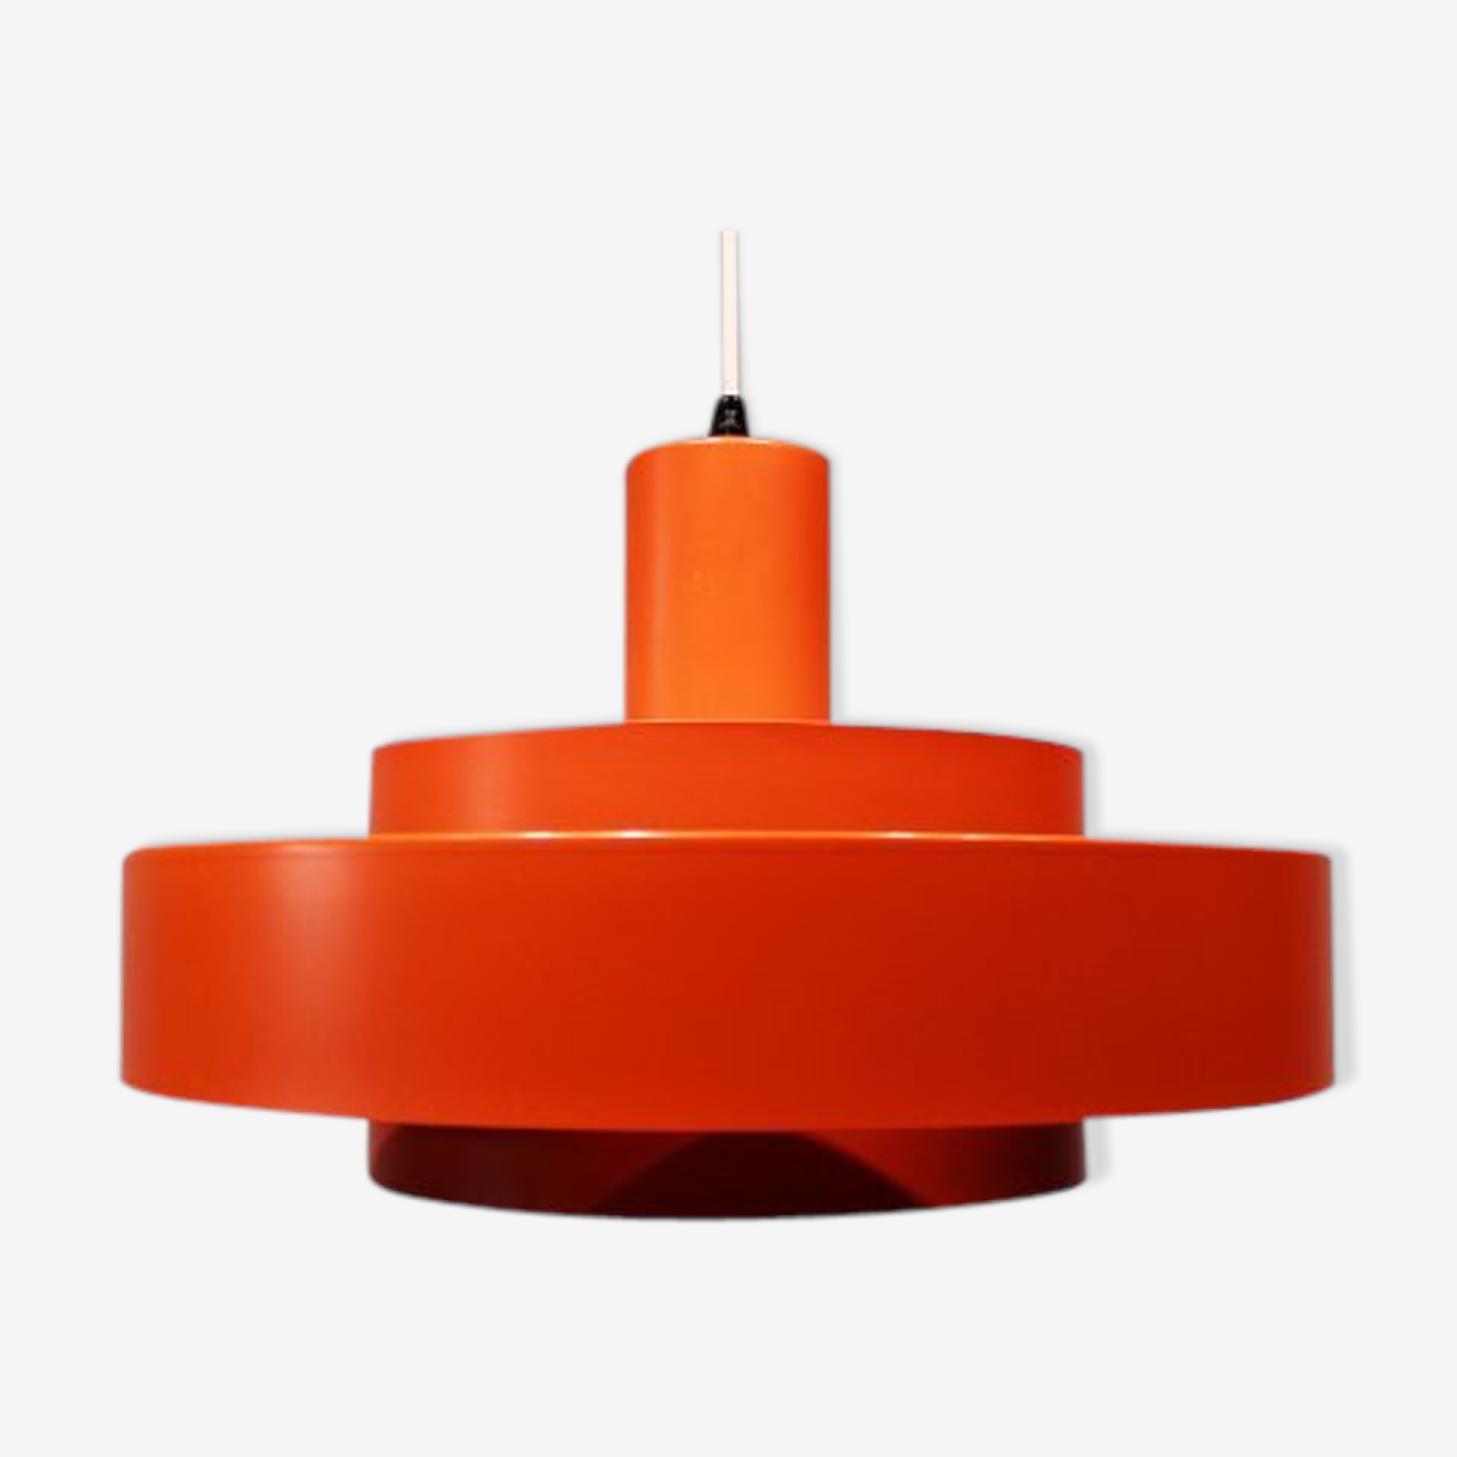 Hanging lamp by Jo Hammerborg